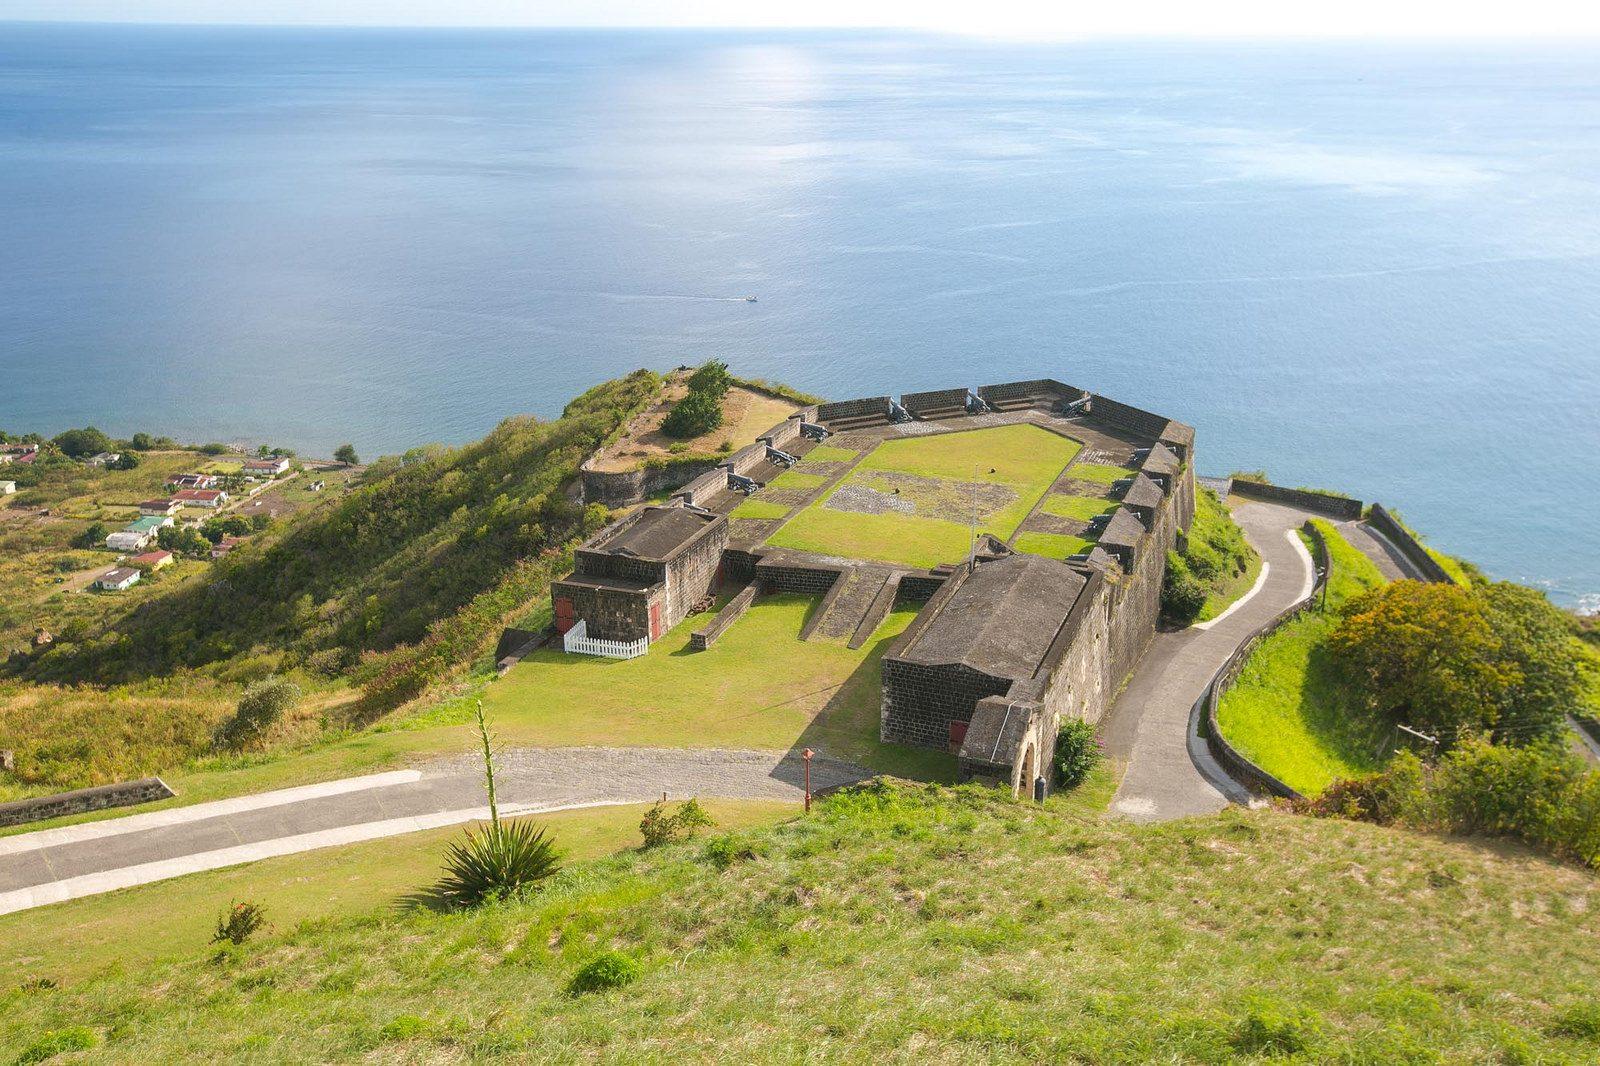 Brimstone St Kitts